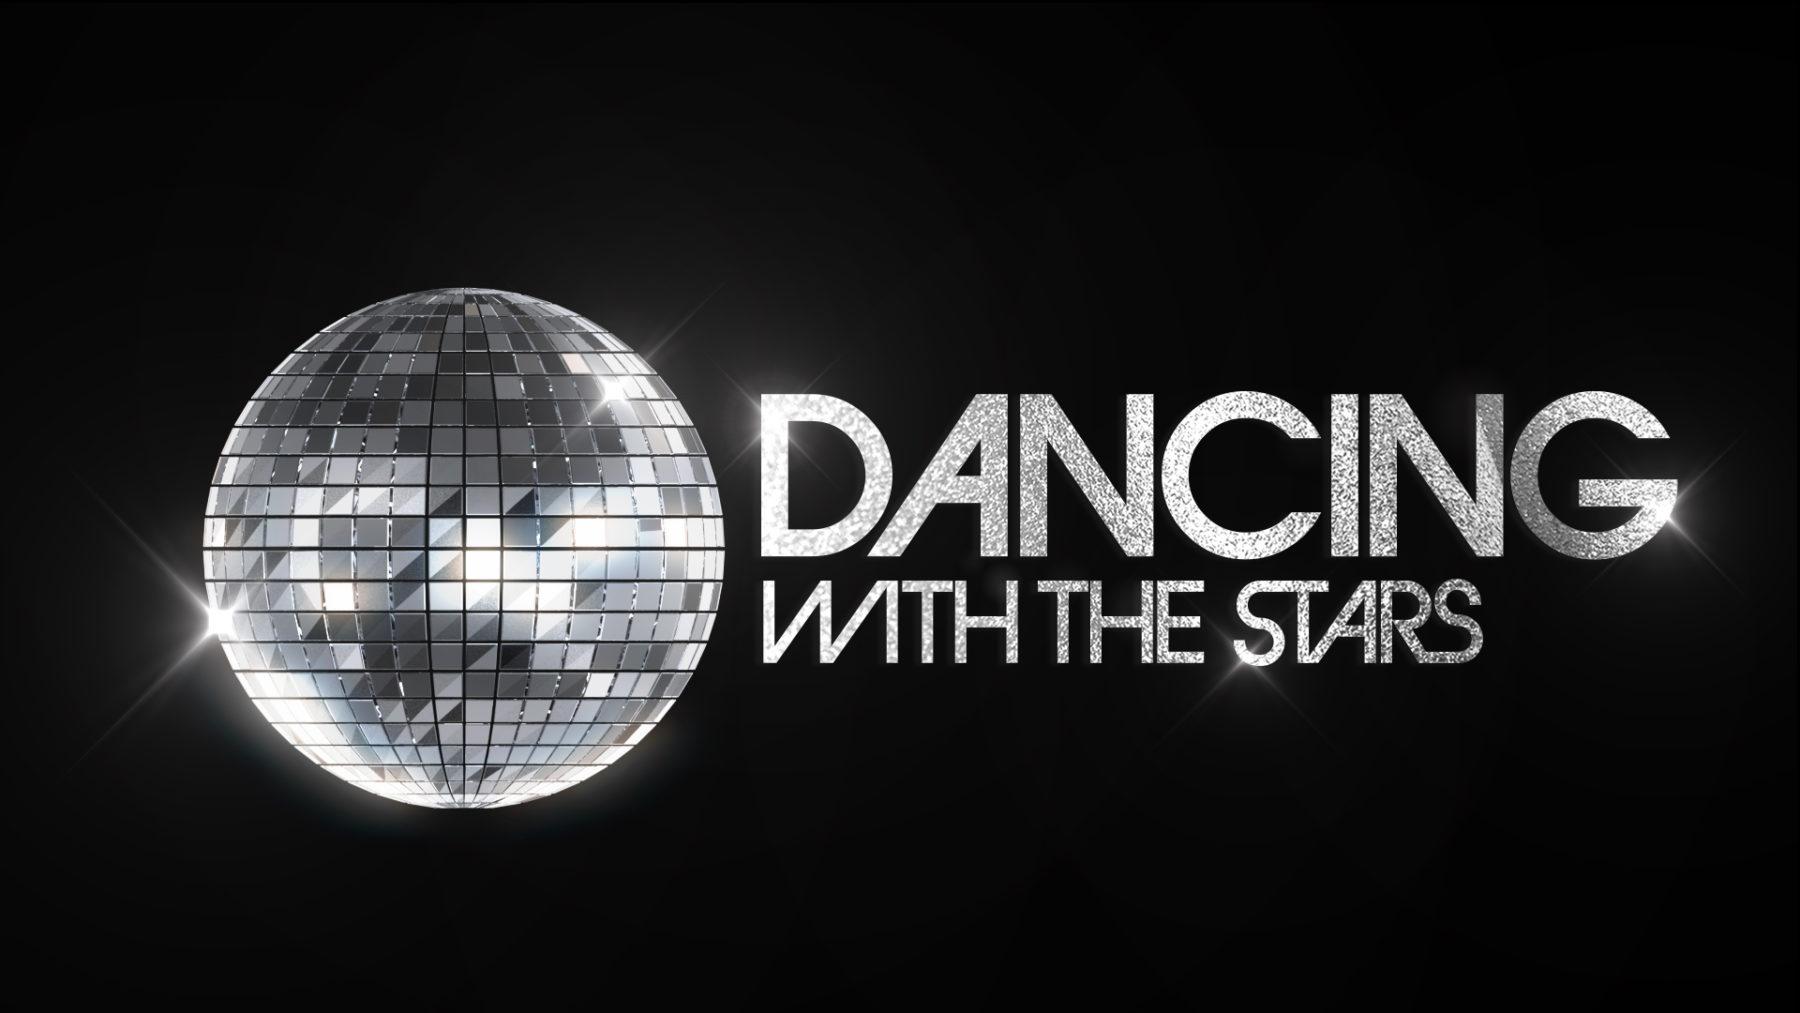 Dancing with the Stars: Αυτοί είναι οι 16 διάσημοι παίκτες που θα χορέψουν